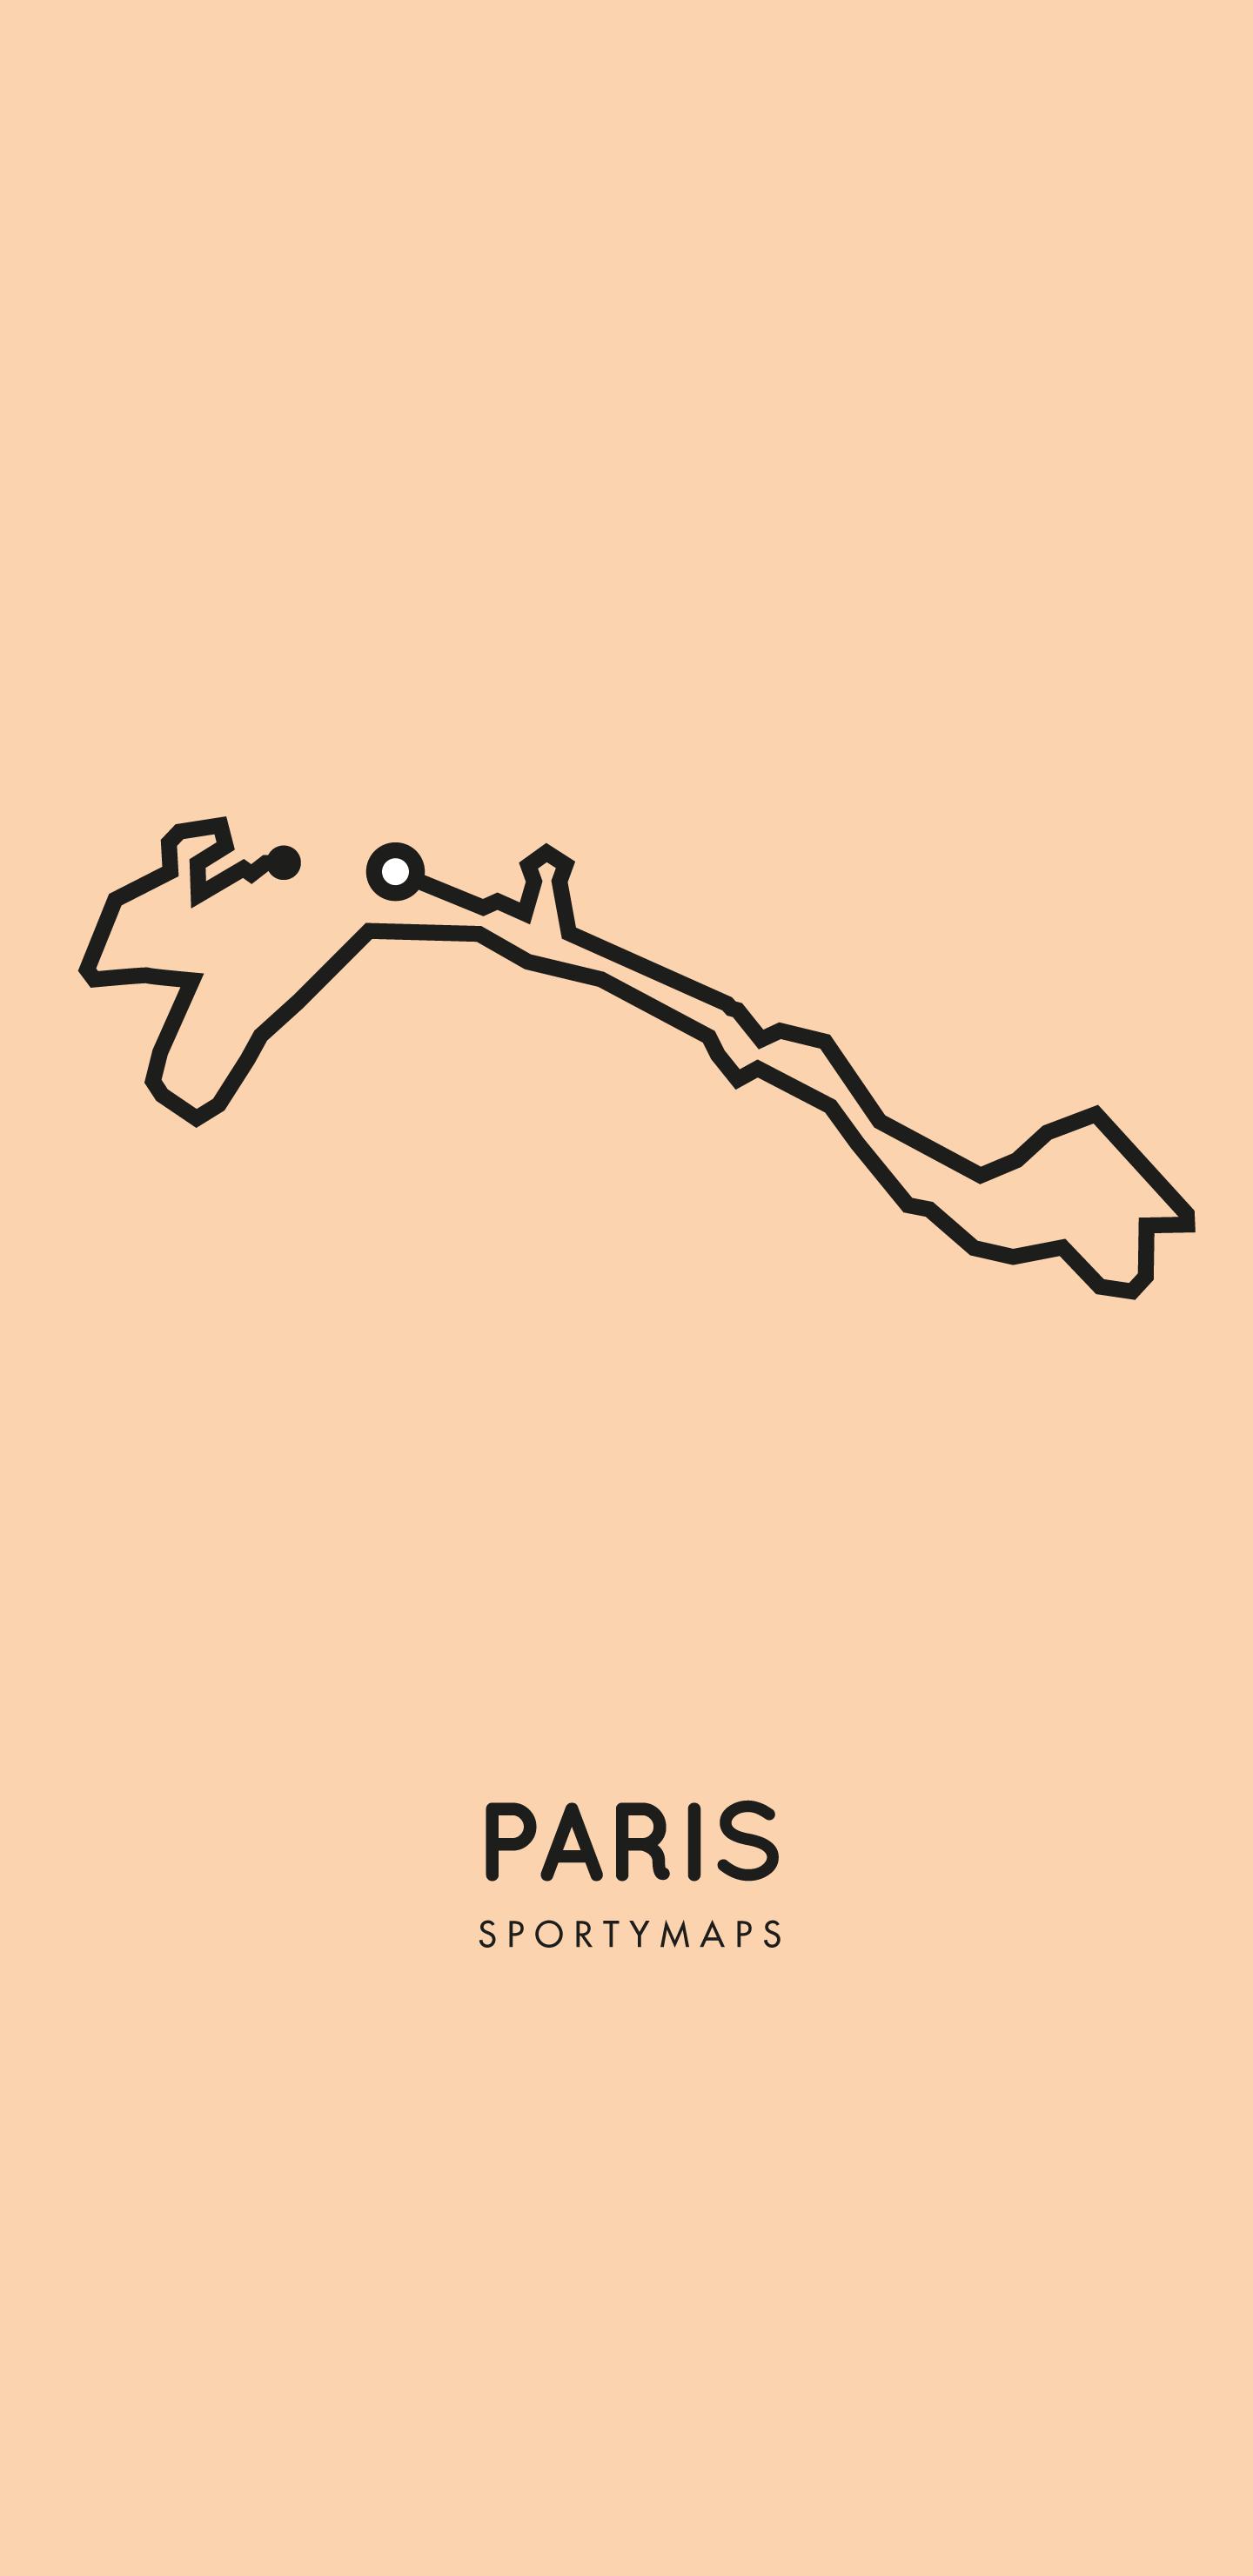 Sportymaps-Paris-marathon-orange